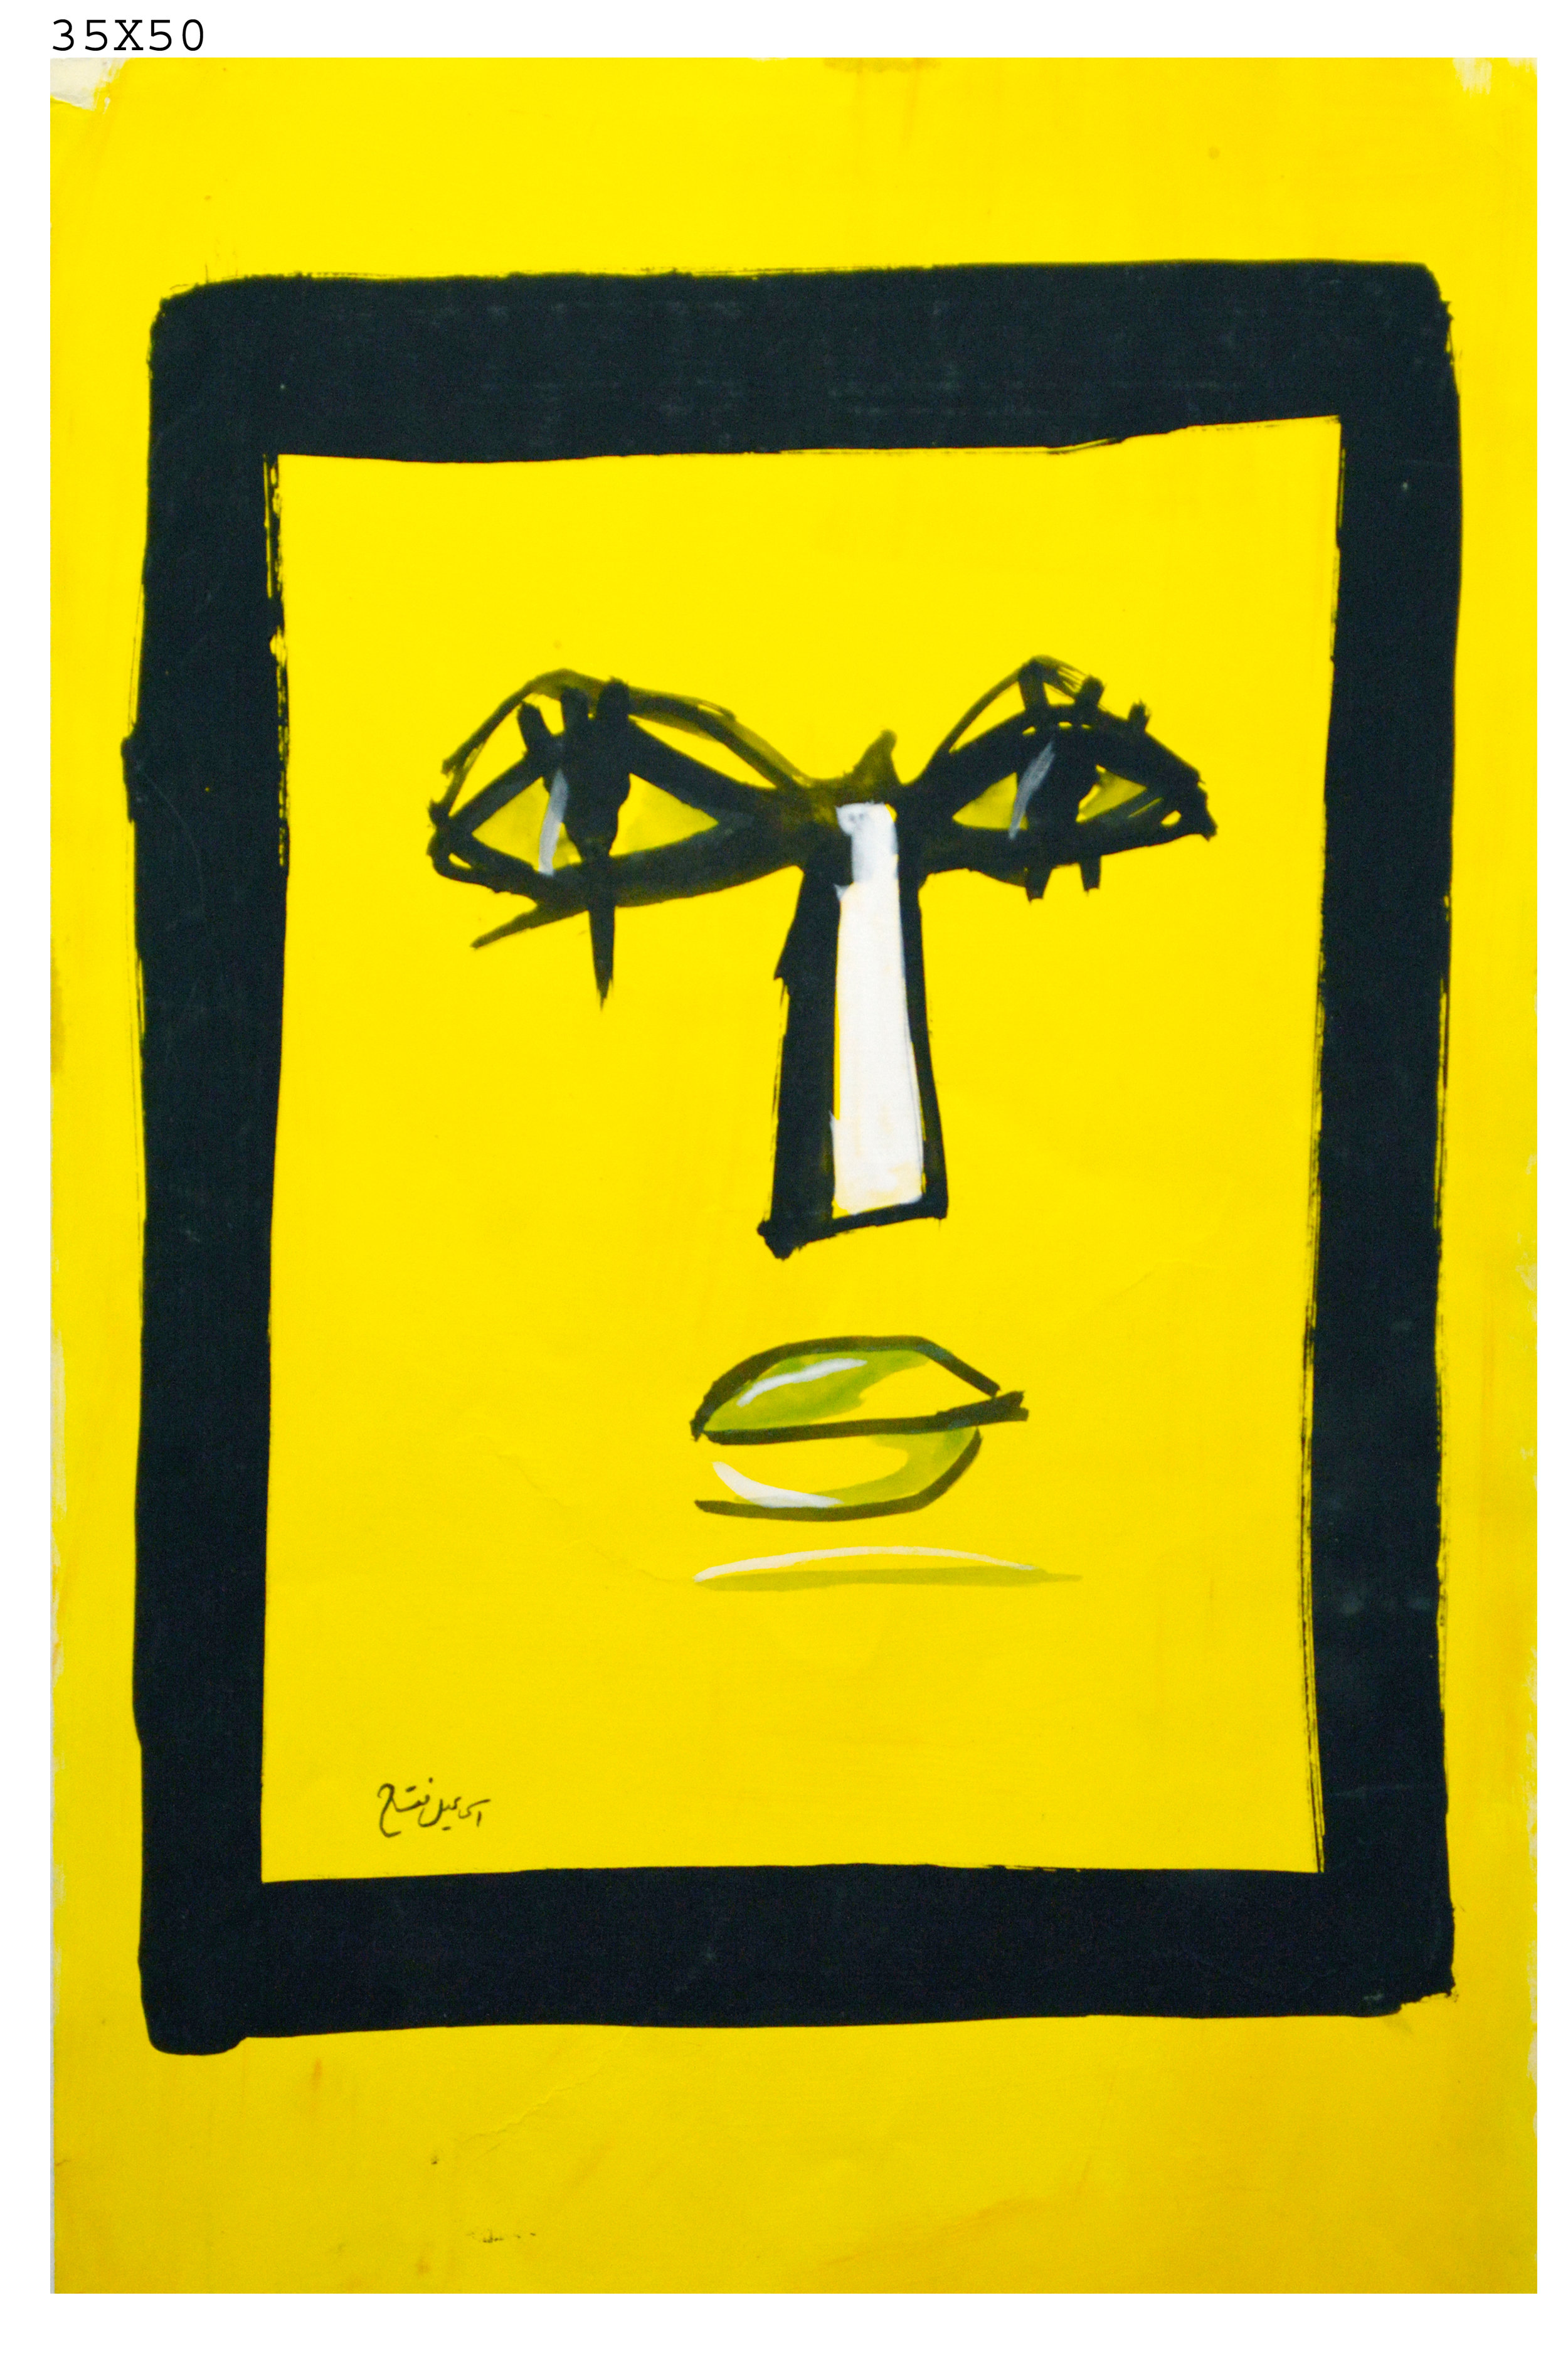 Lot 21:  Ismail Fattah - الفنان اسماعيل فتاح (Iraq) 1934 - 2004,  Gouache on paper Est $3,000 - $5,000